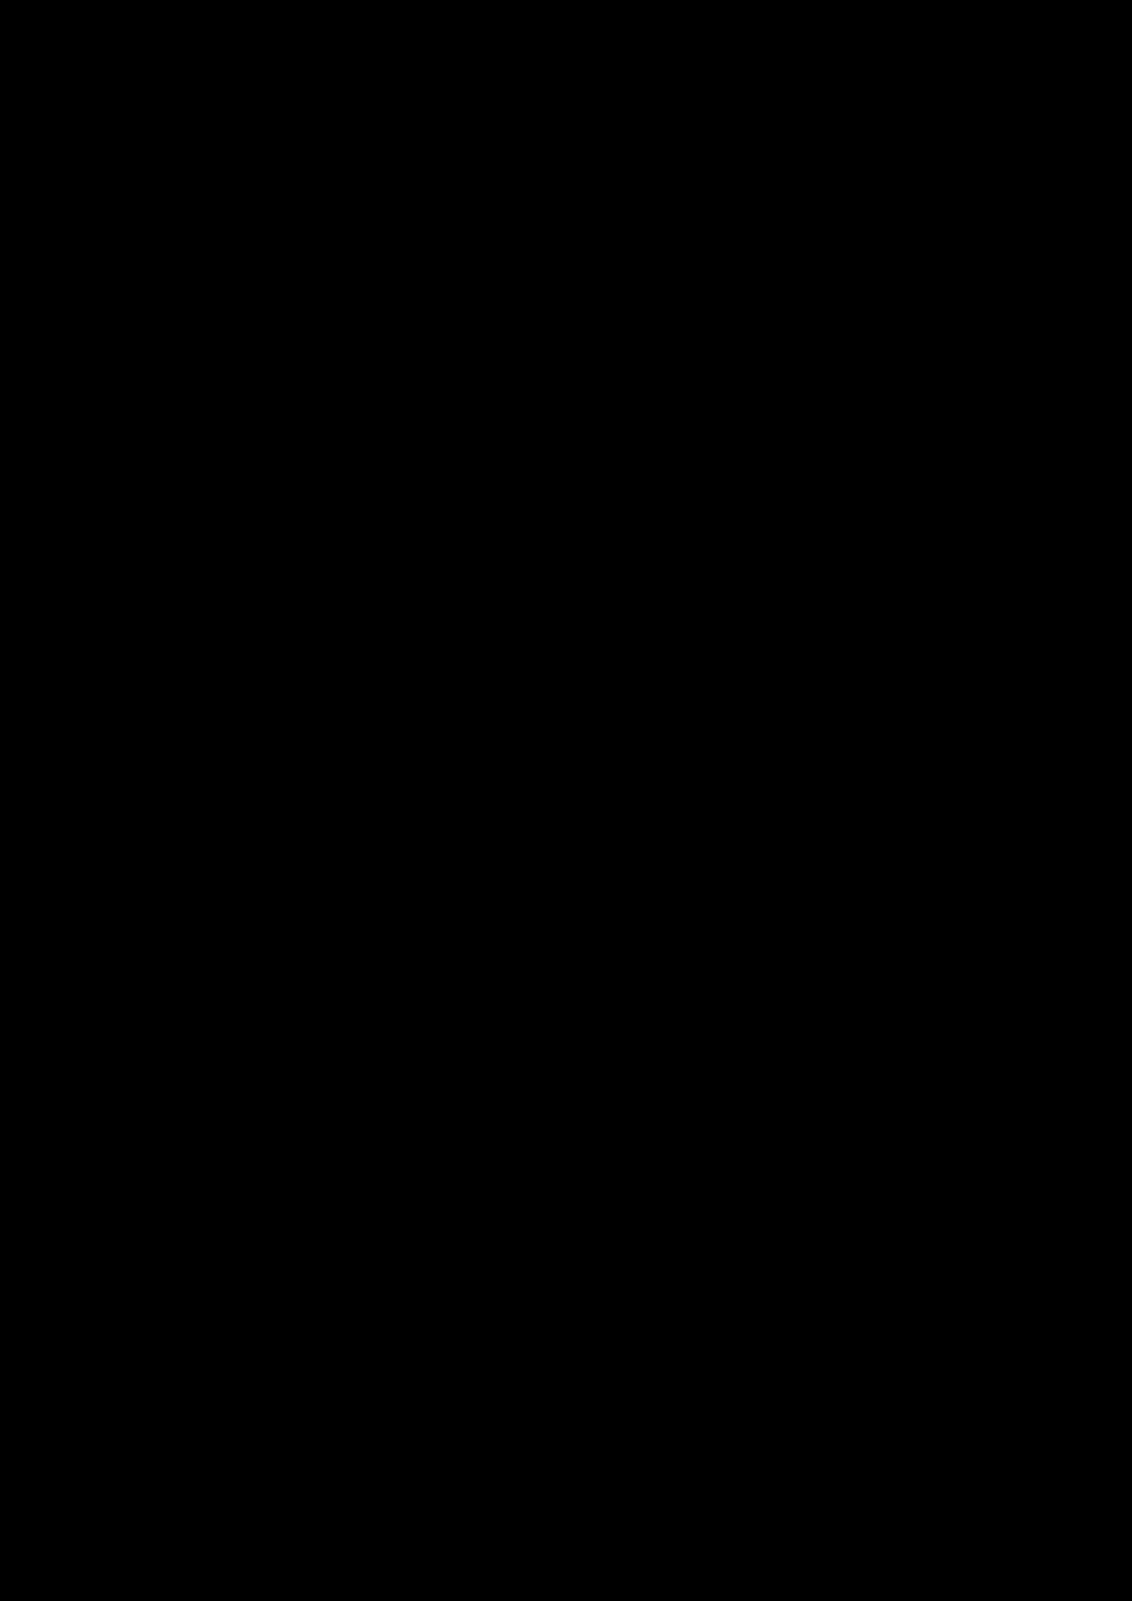 Korolevstvo slez slide, Image 71